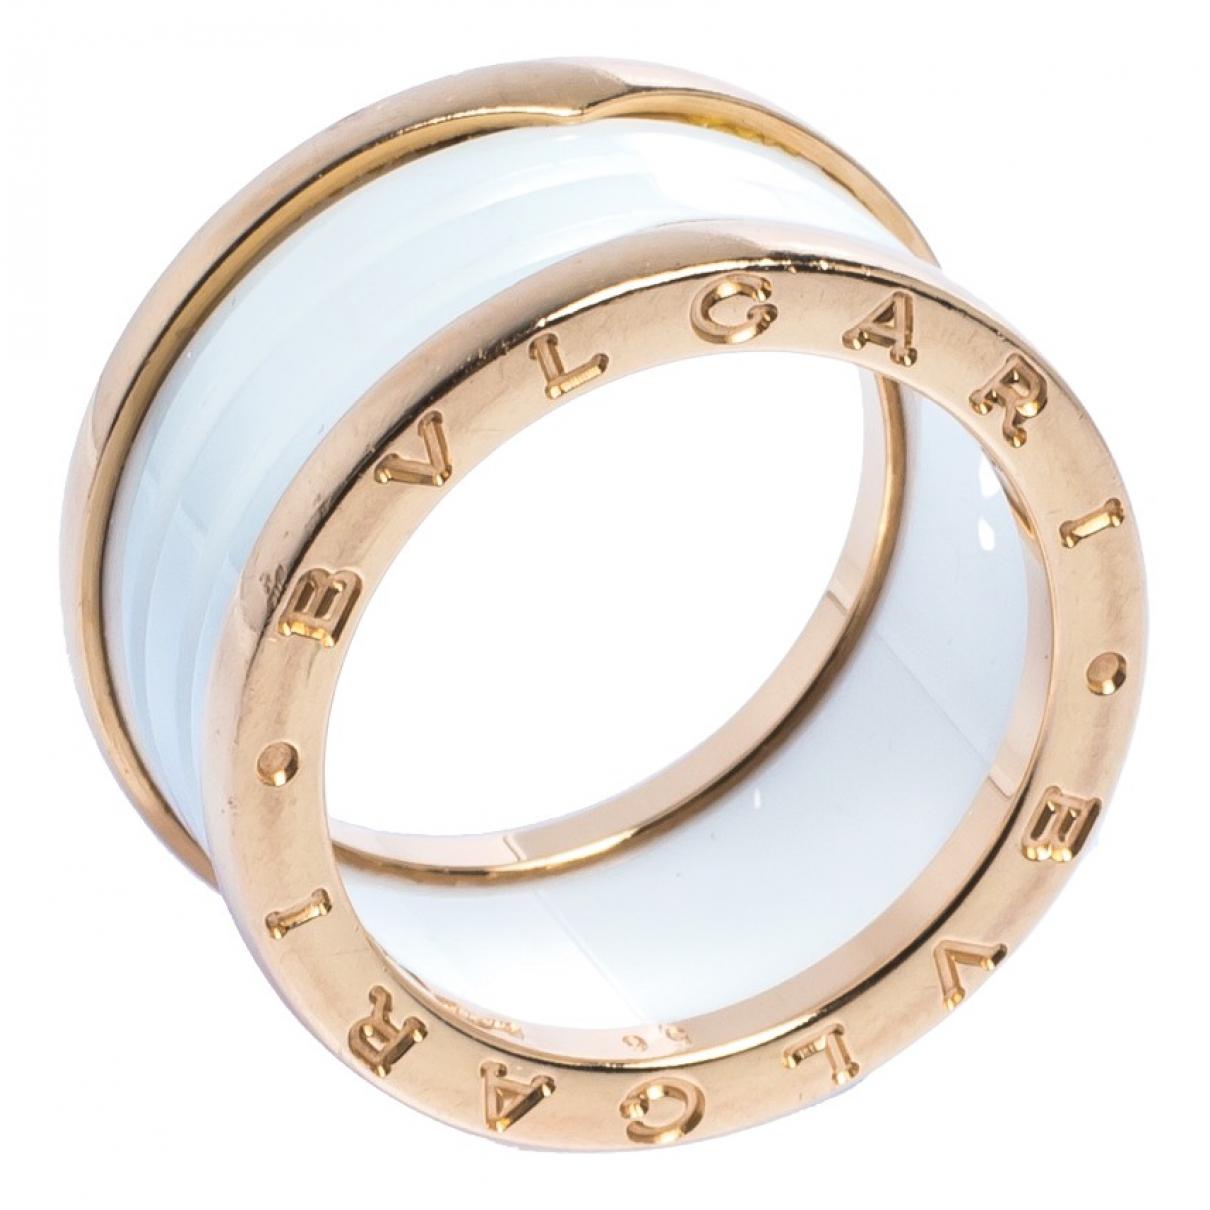 Bvlgari - Bague B.Zero1 pour femme en or jaune